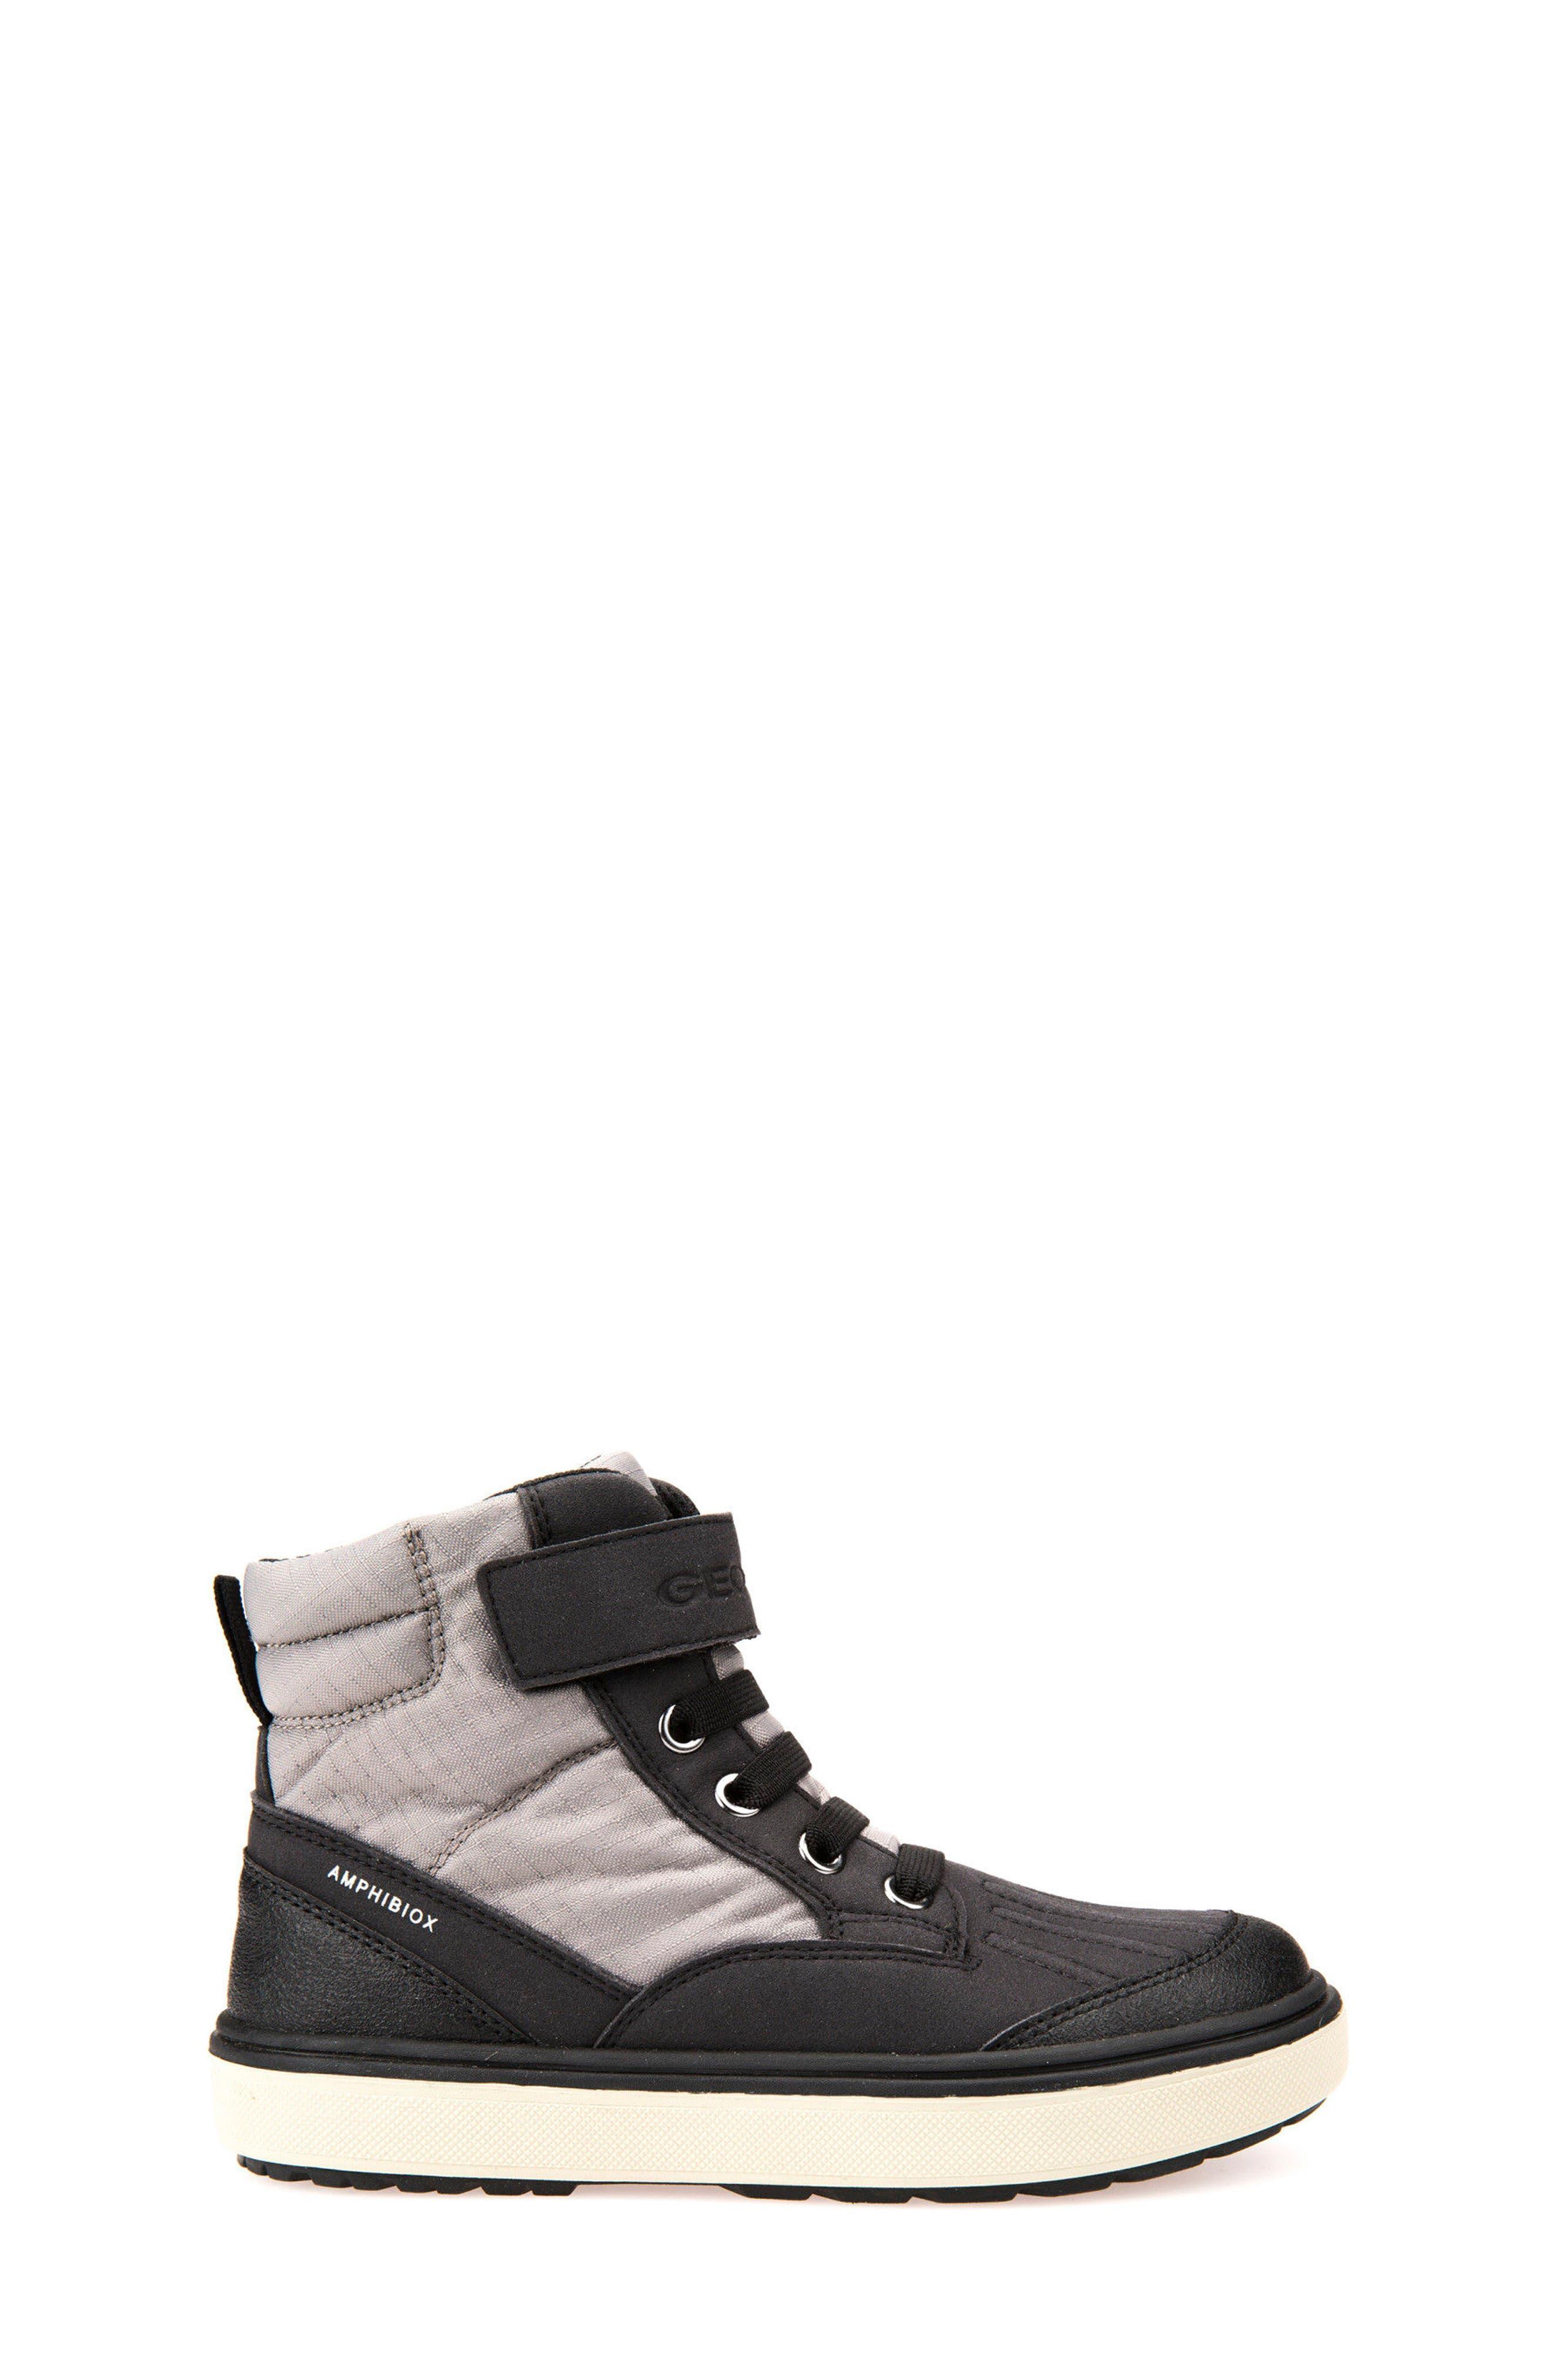 'Mattias - ABX' Amphibiox<sup>®</sup> Waterproof Sneaker,                             Alternate thumbnail 3, color,                             061